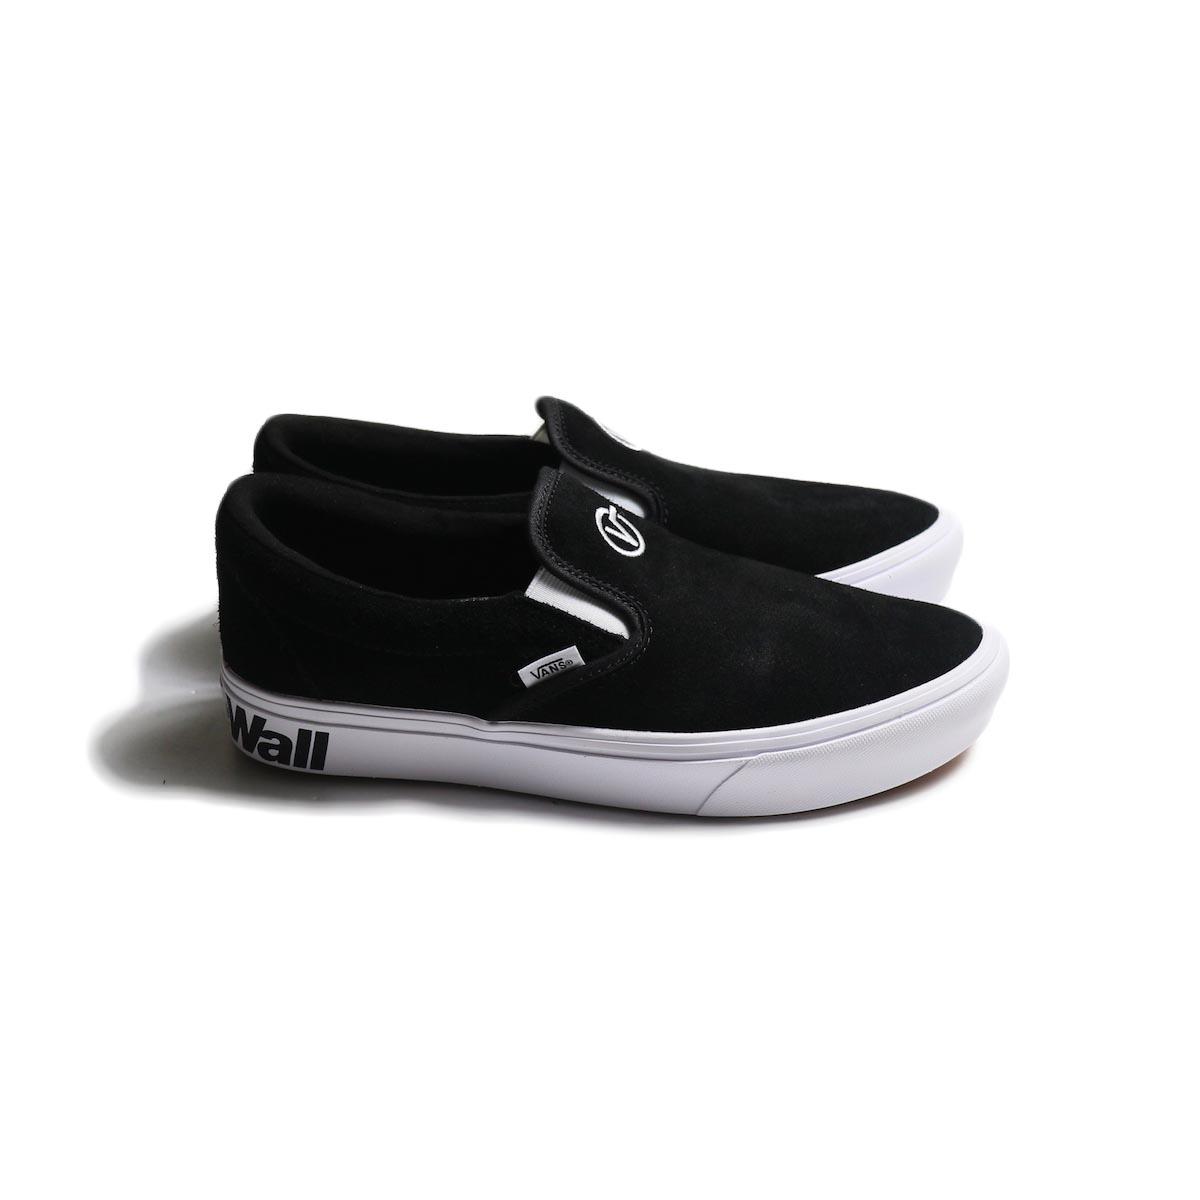 VANS / COMFYCUSH SLIP-ON (DISTORT) -Black/True White